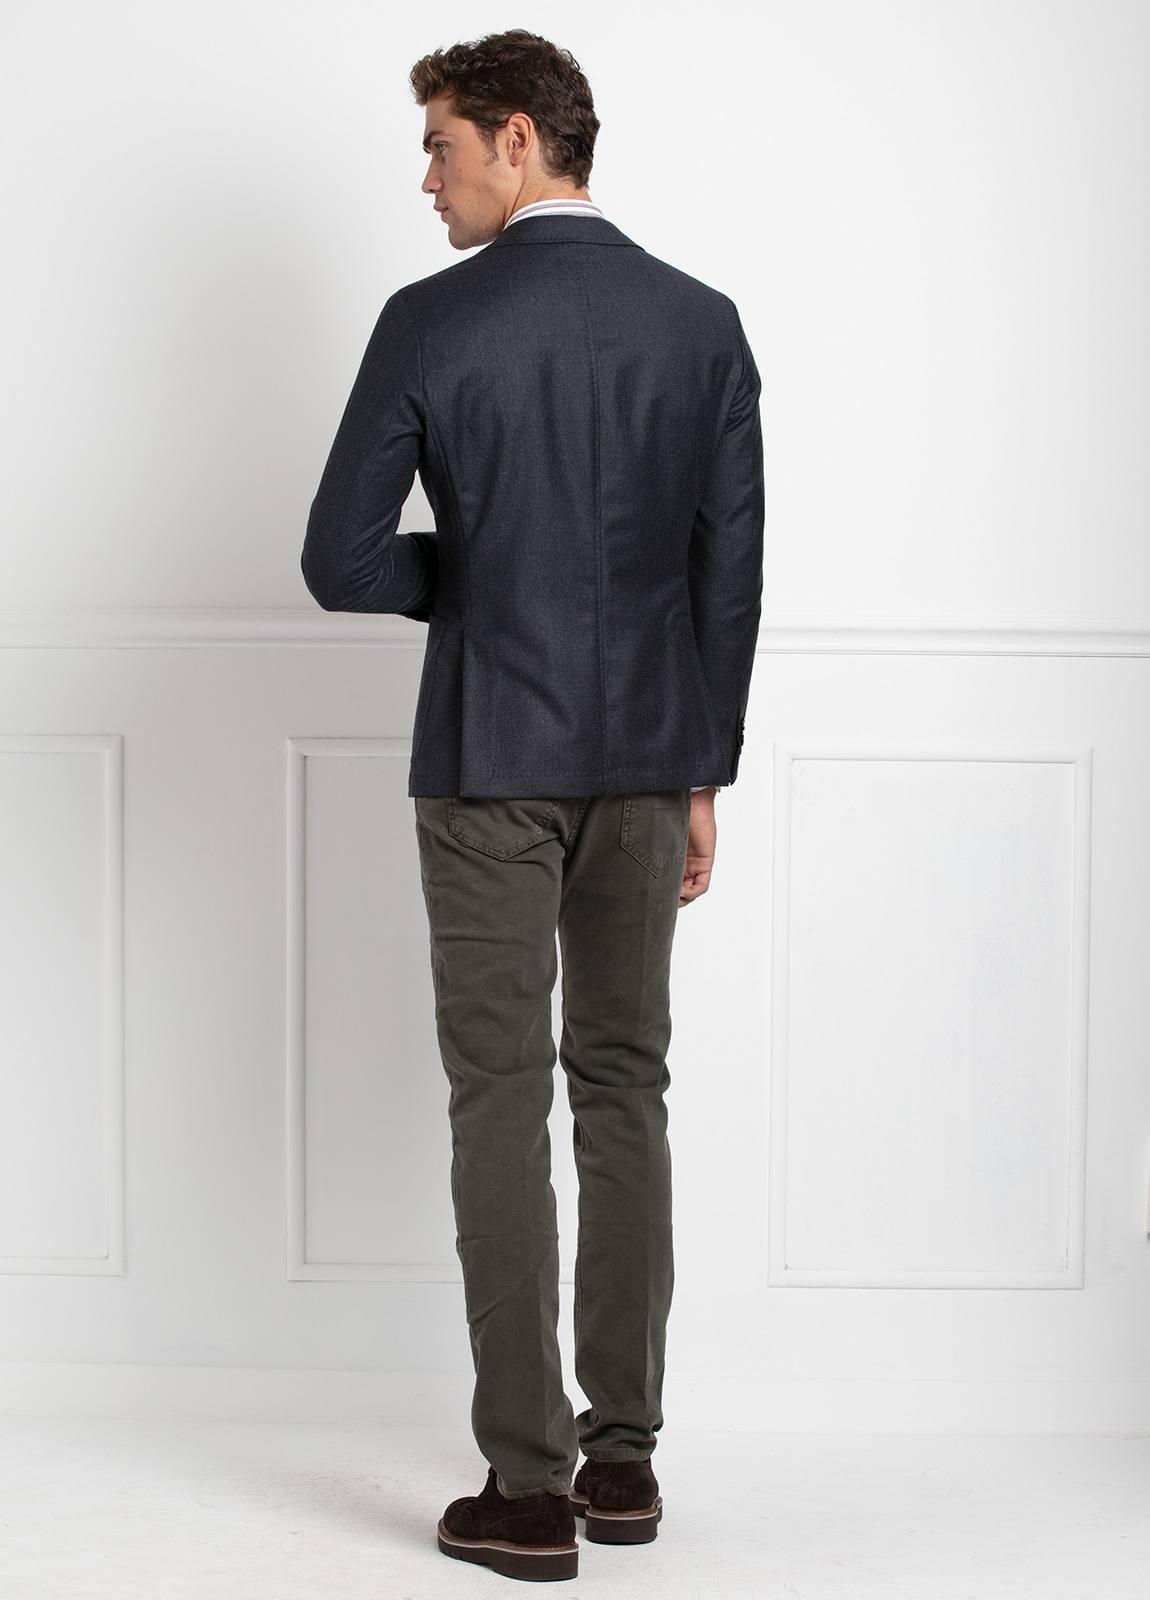 Americana SOFT JACKET Slim Fit, diseño tipo Cheviot cuadro vichy color gris. 100% Lana. - Ítem3